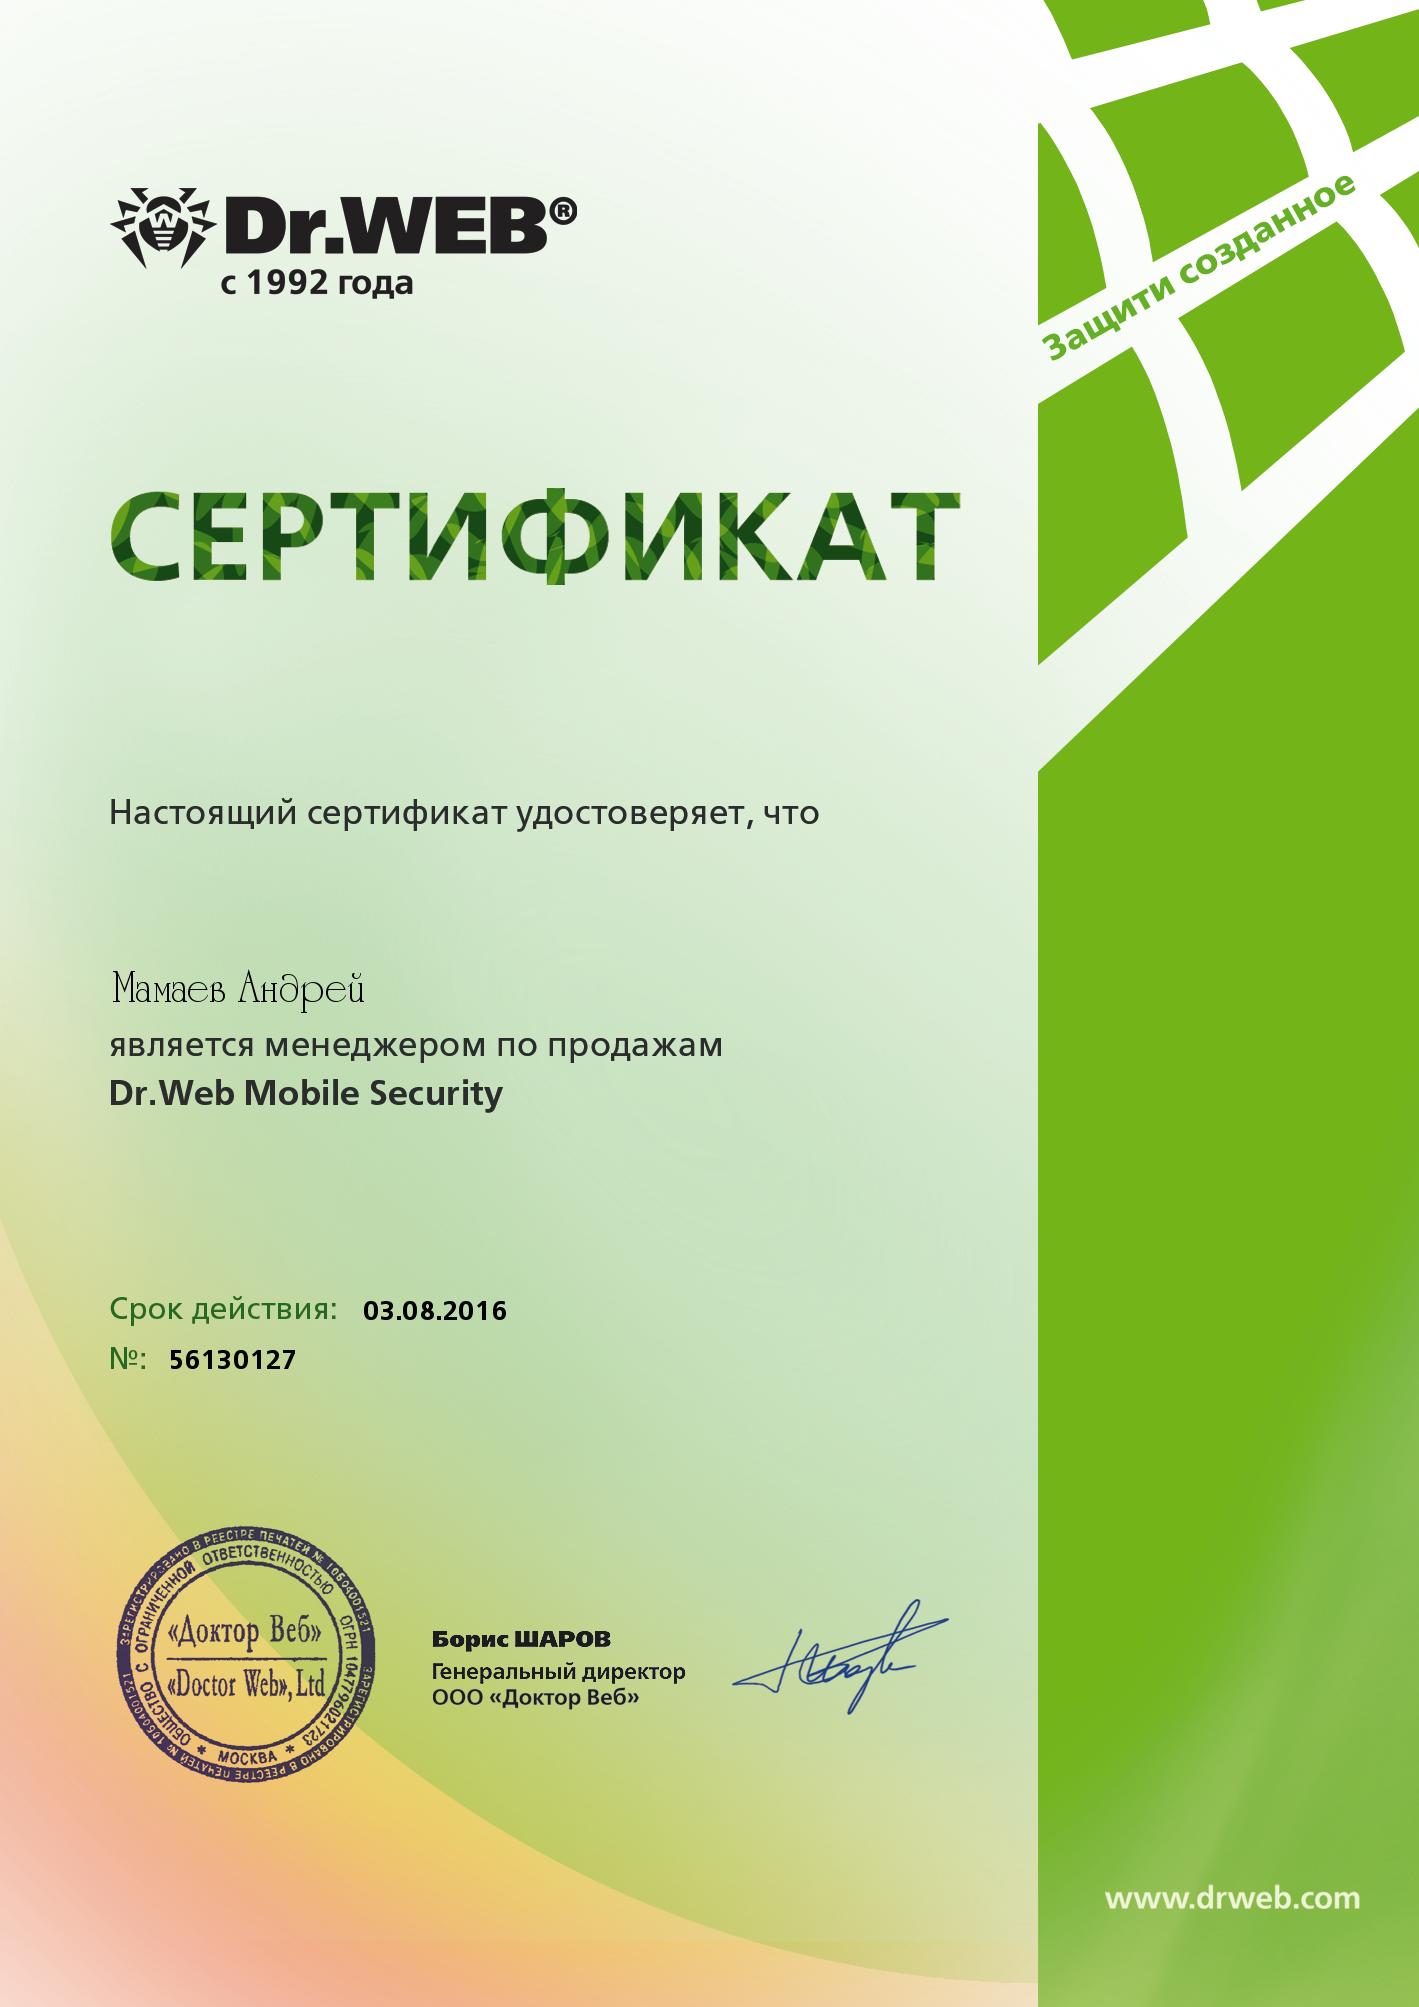 (DWCERT-010-7) менеджер по продажам Dr.Web Mobile Security (Мамаев) 03.08.2016